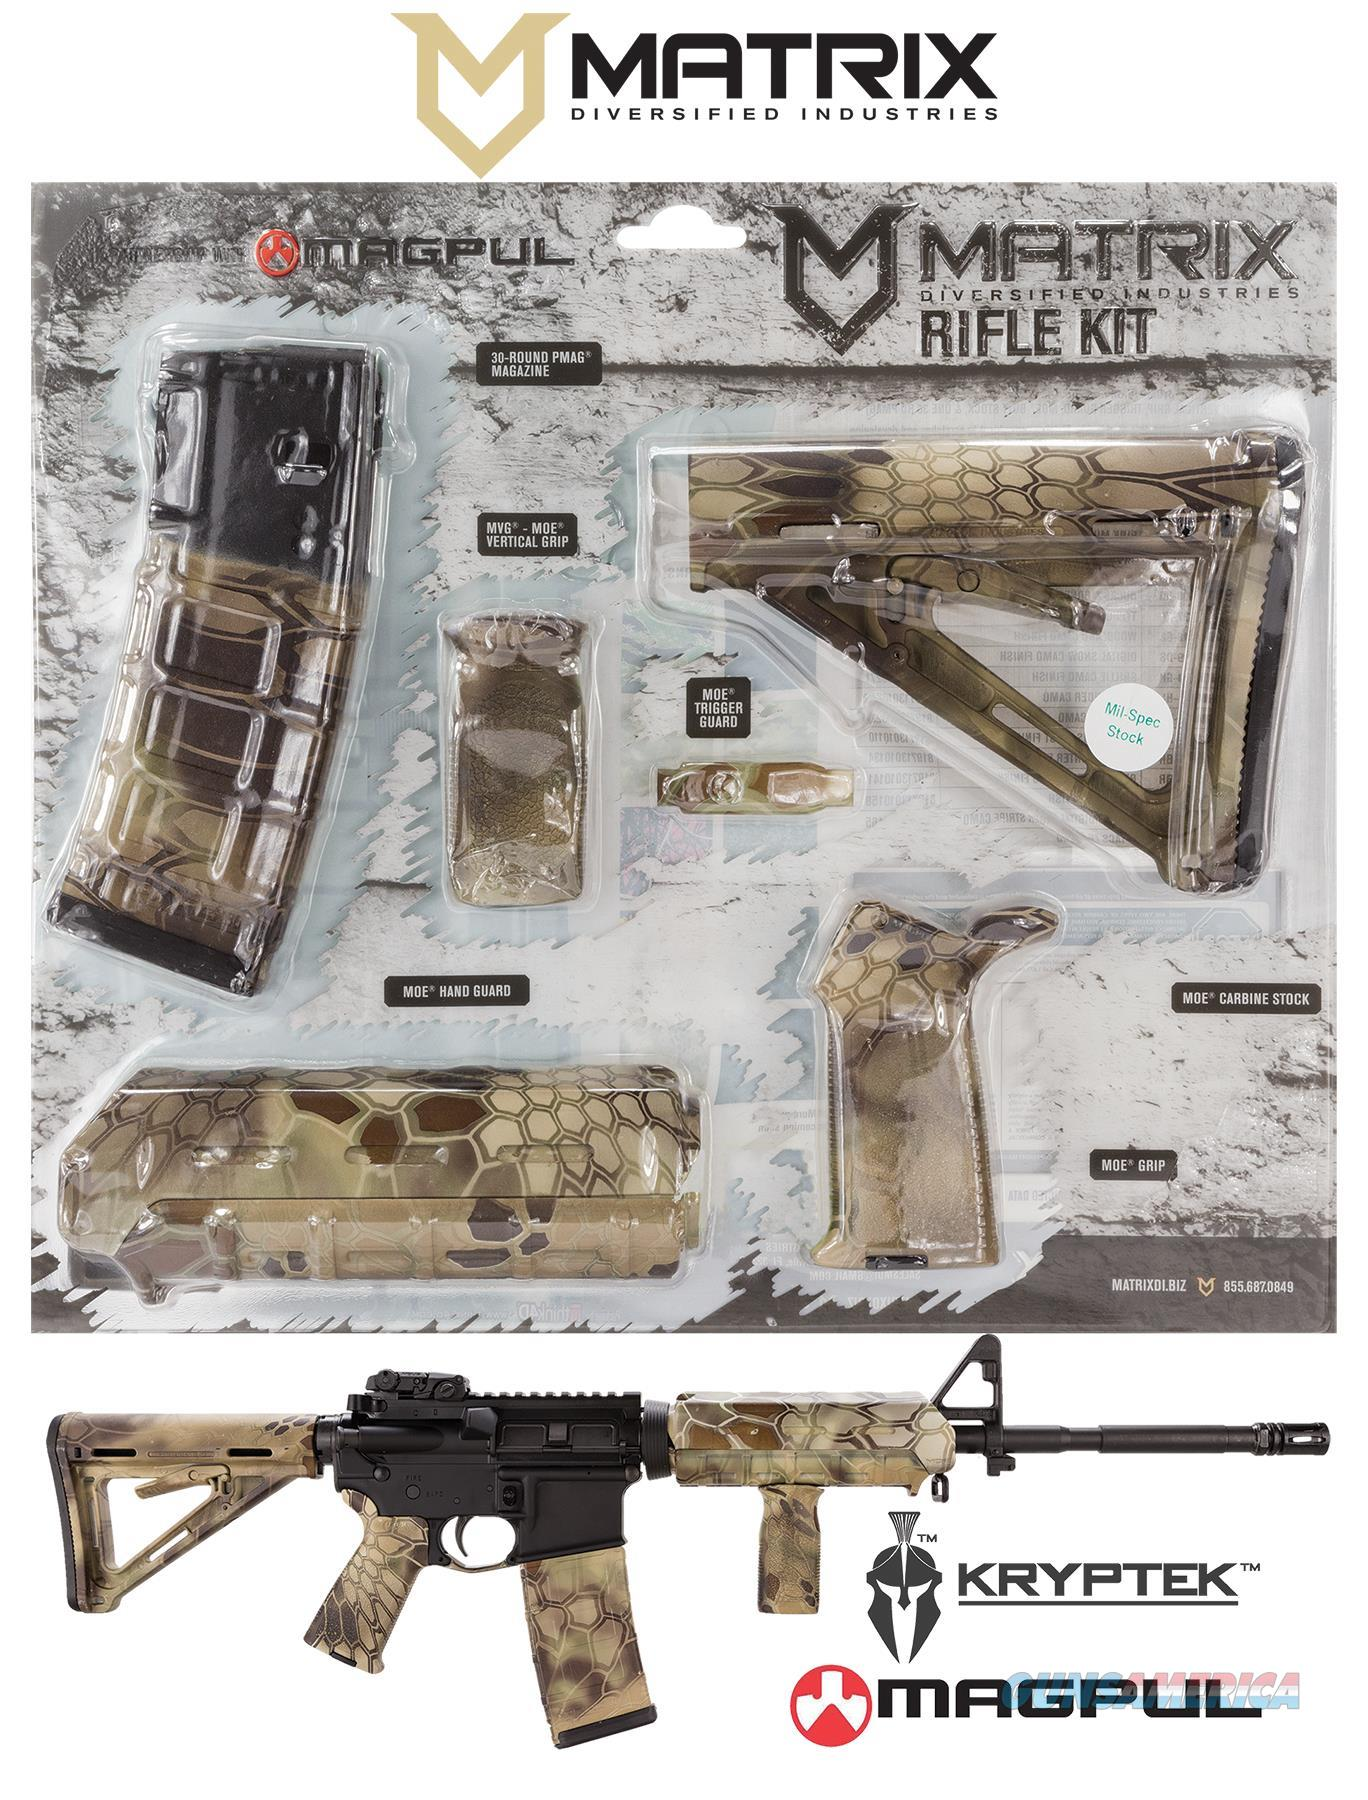 Mdi Magcom47-Hl Kryptek Highlander Magpul Moe Kit Ar-15 Polymer MAGCOM47HL  Non-Guns > Gunstocks, Grips & Wood